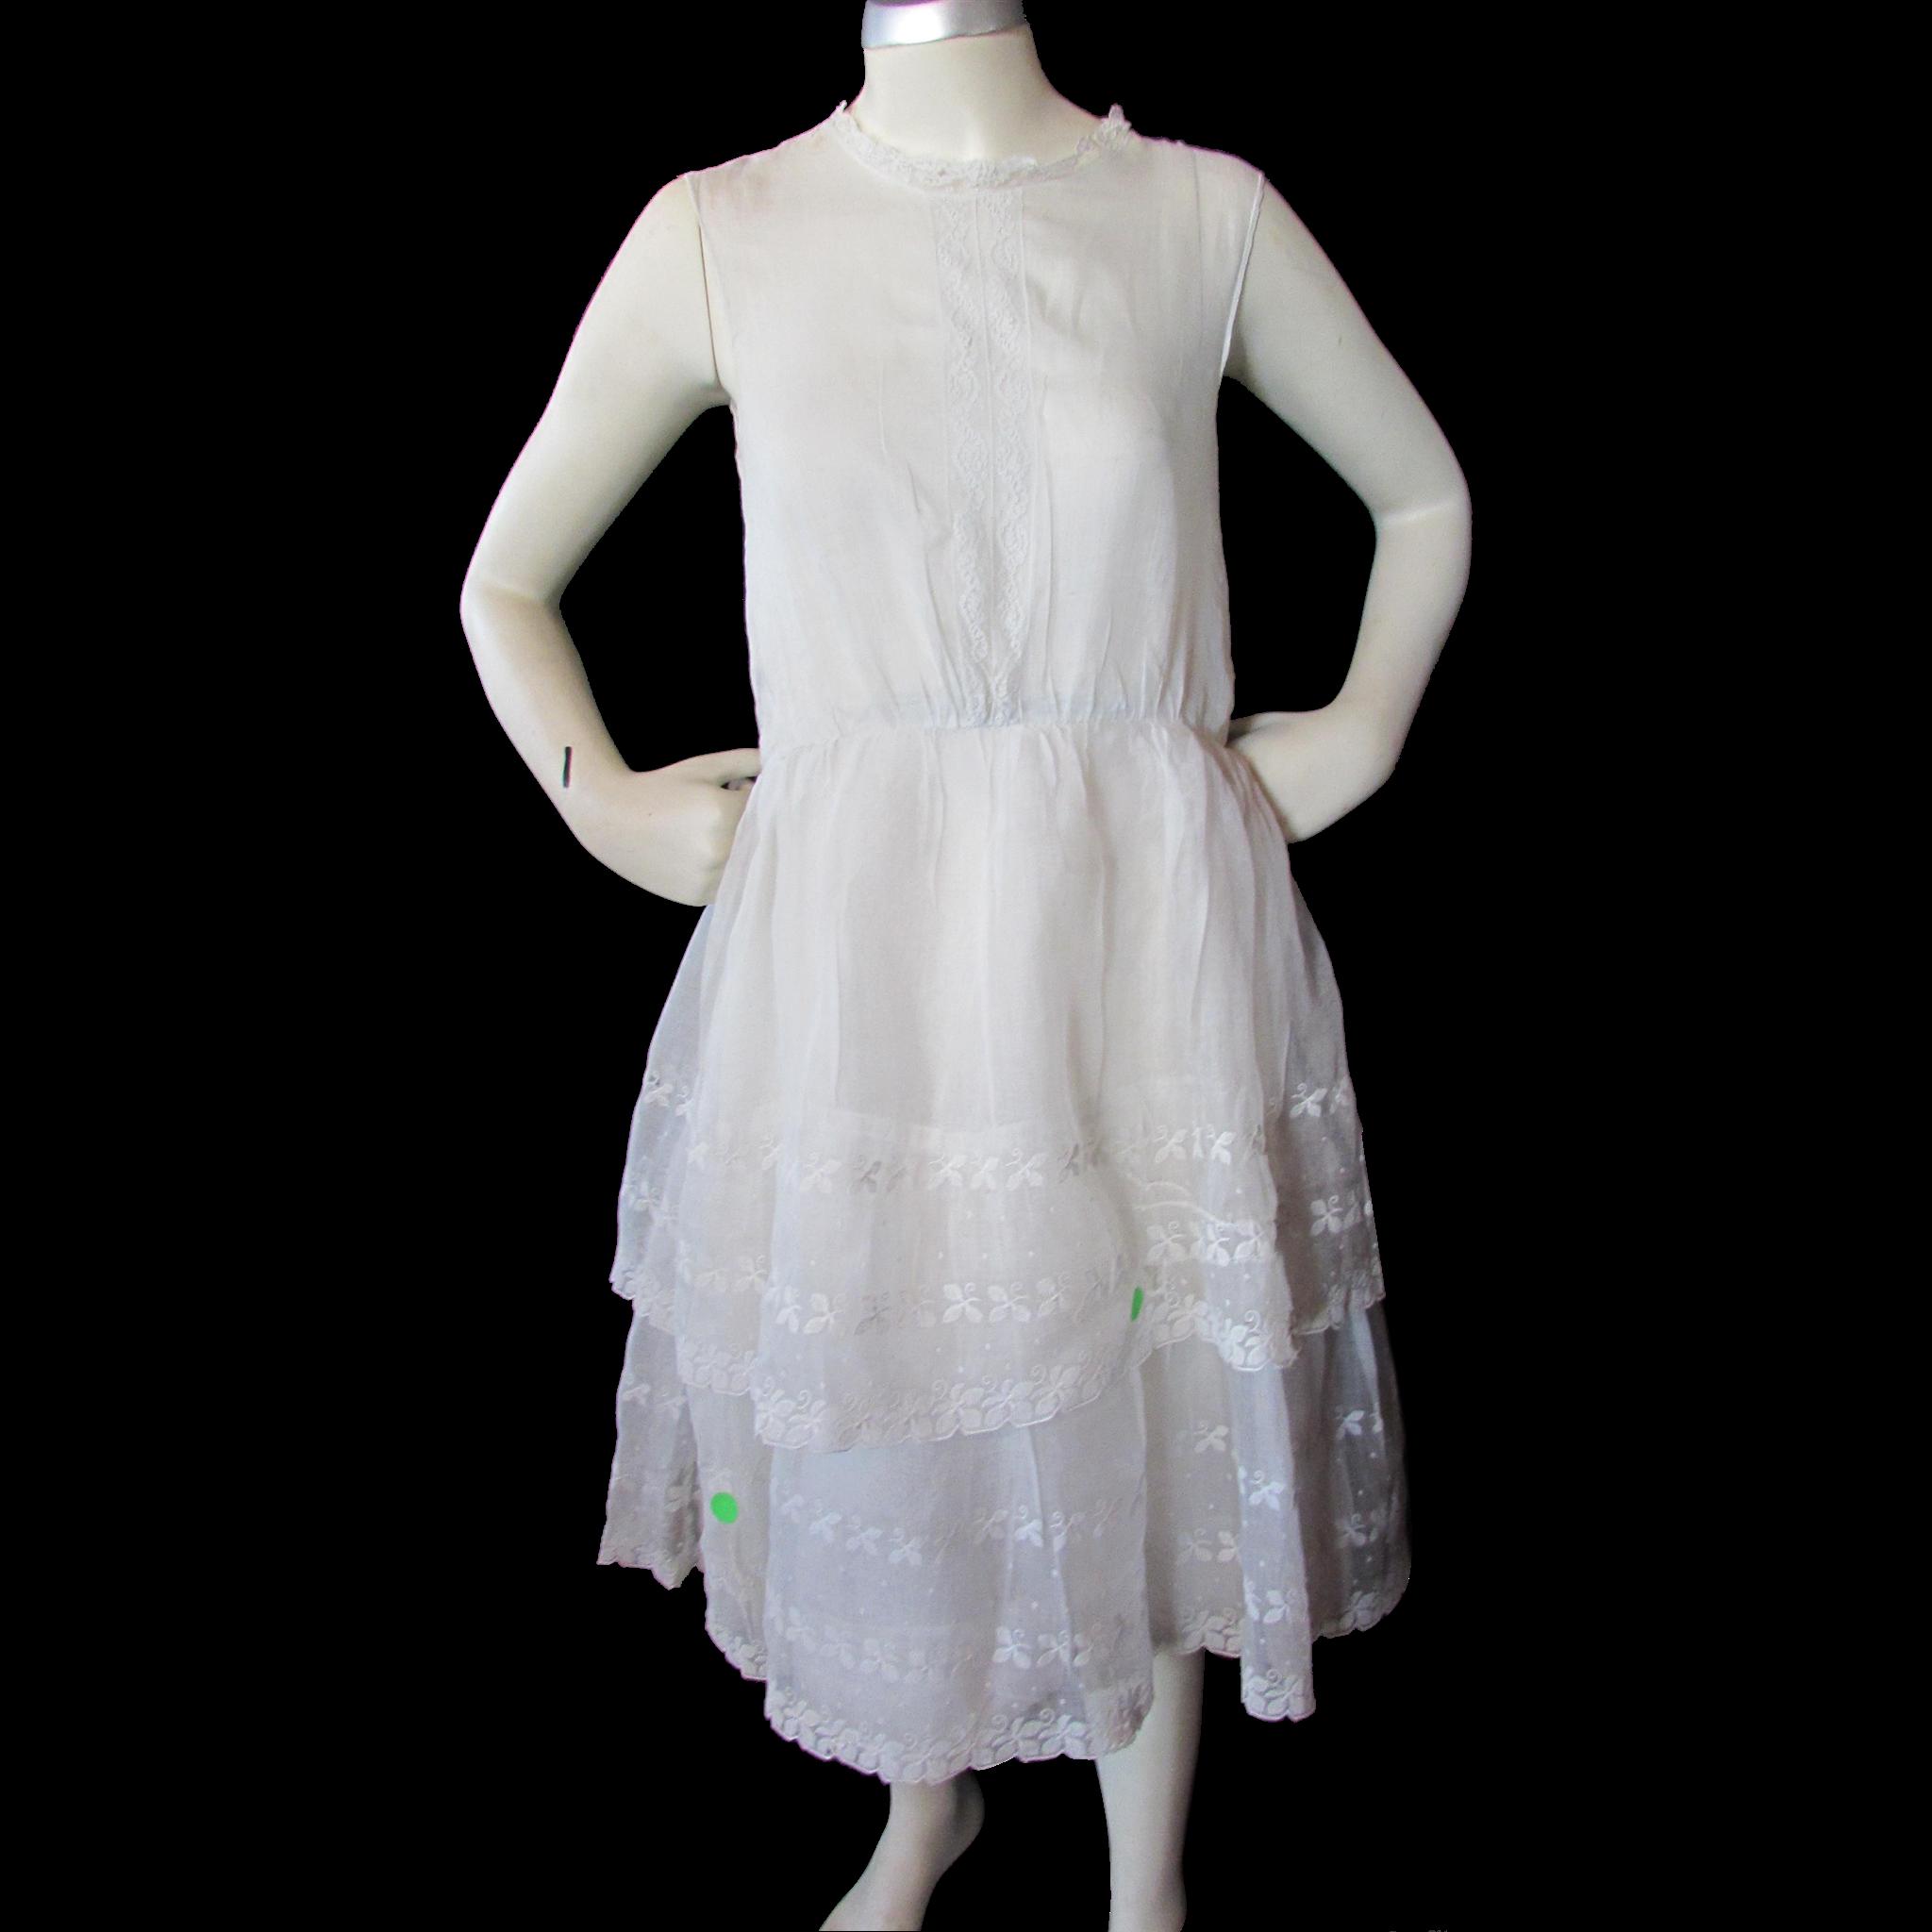 1920 Era Adolescent Girl's Organdy Summer Dress with Eyelet Flounces